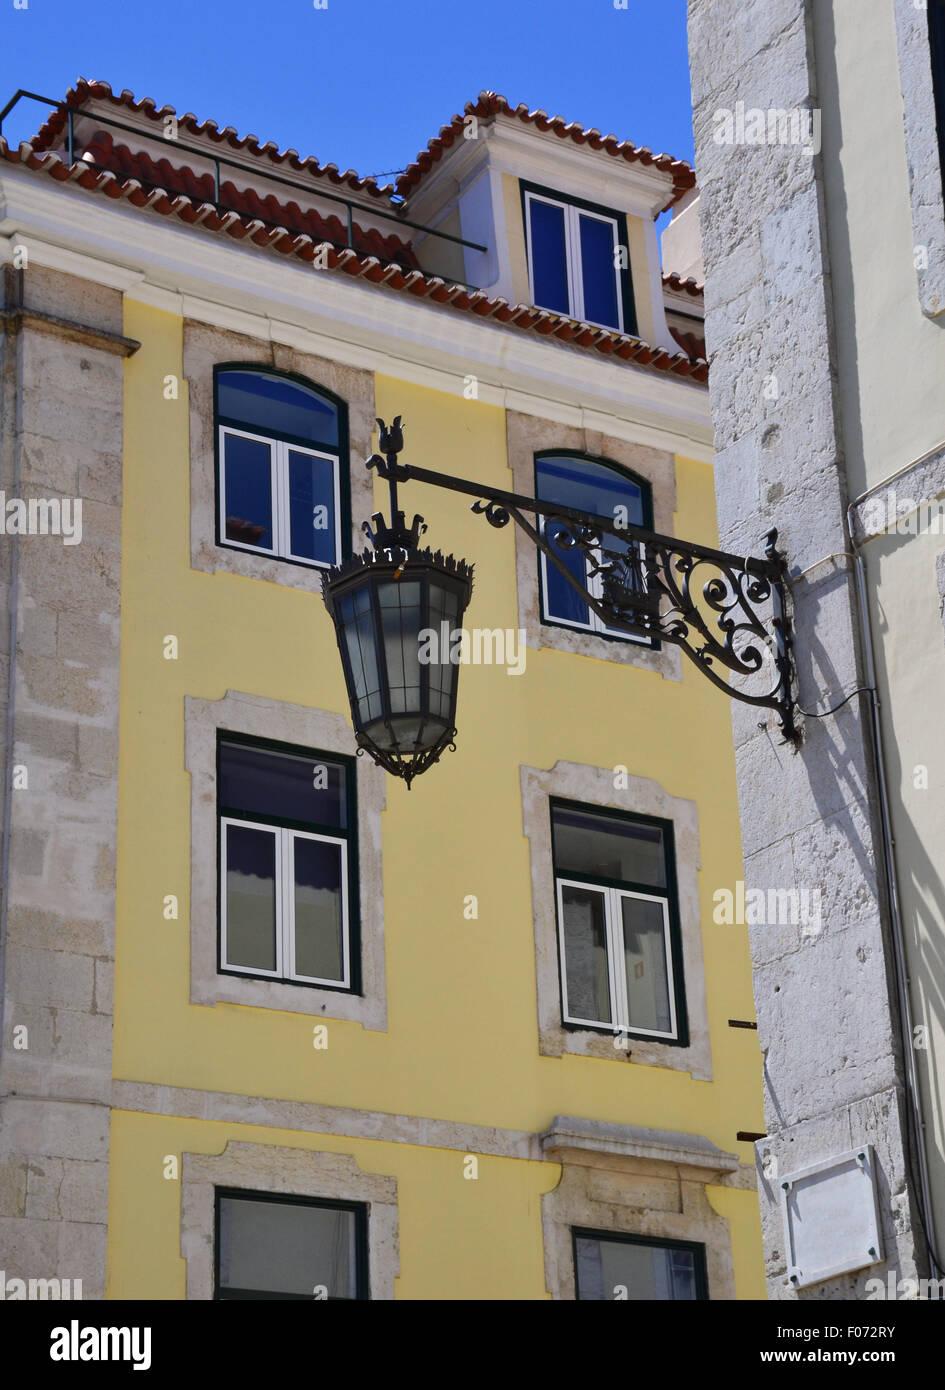 Old iron street lantern on a wall - Stock Image